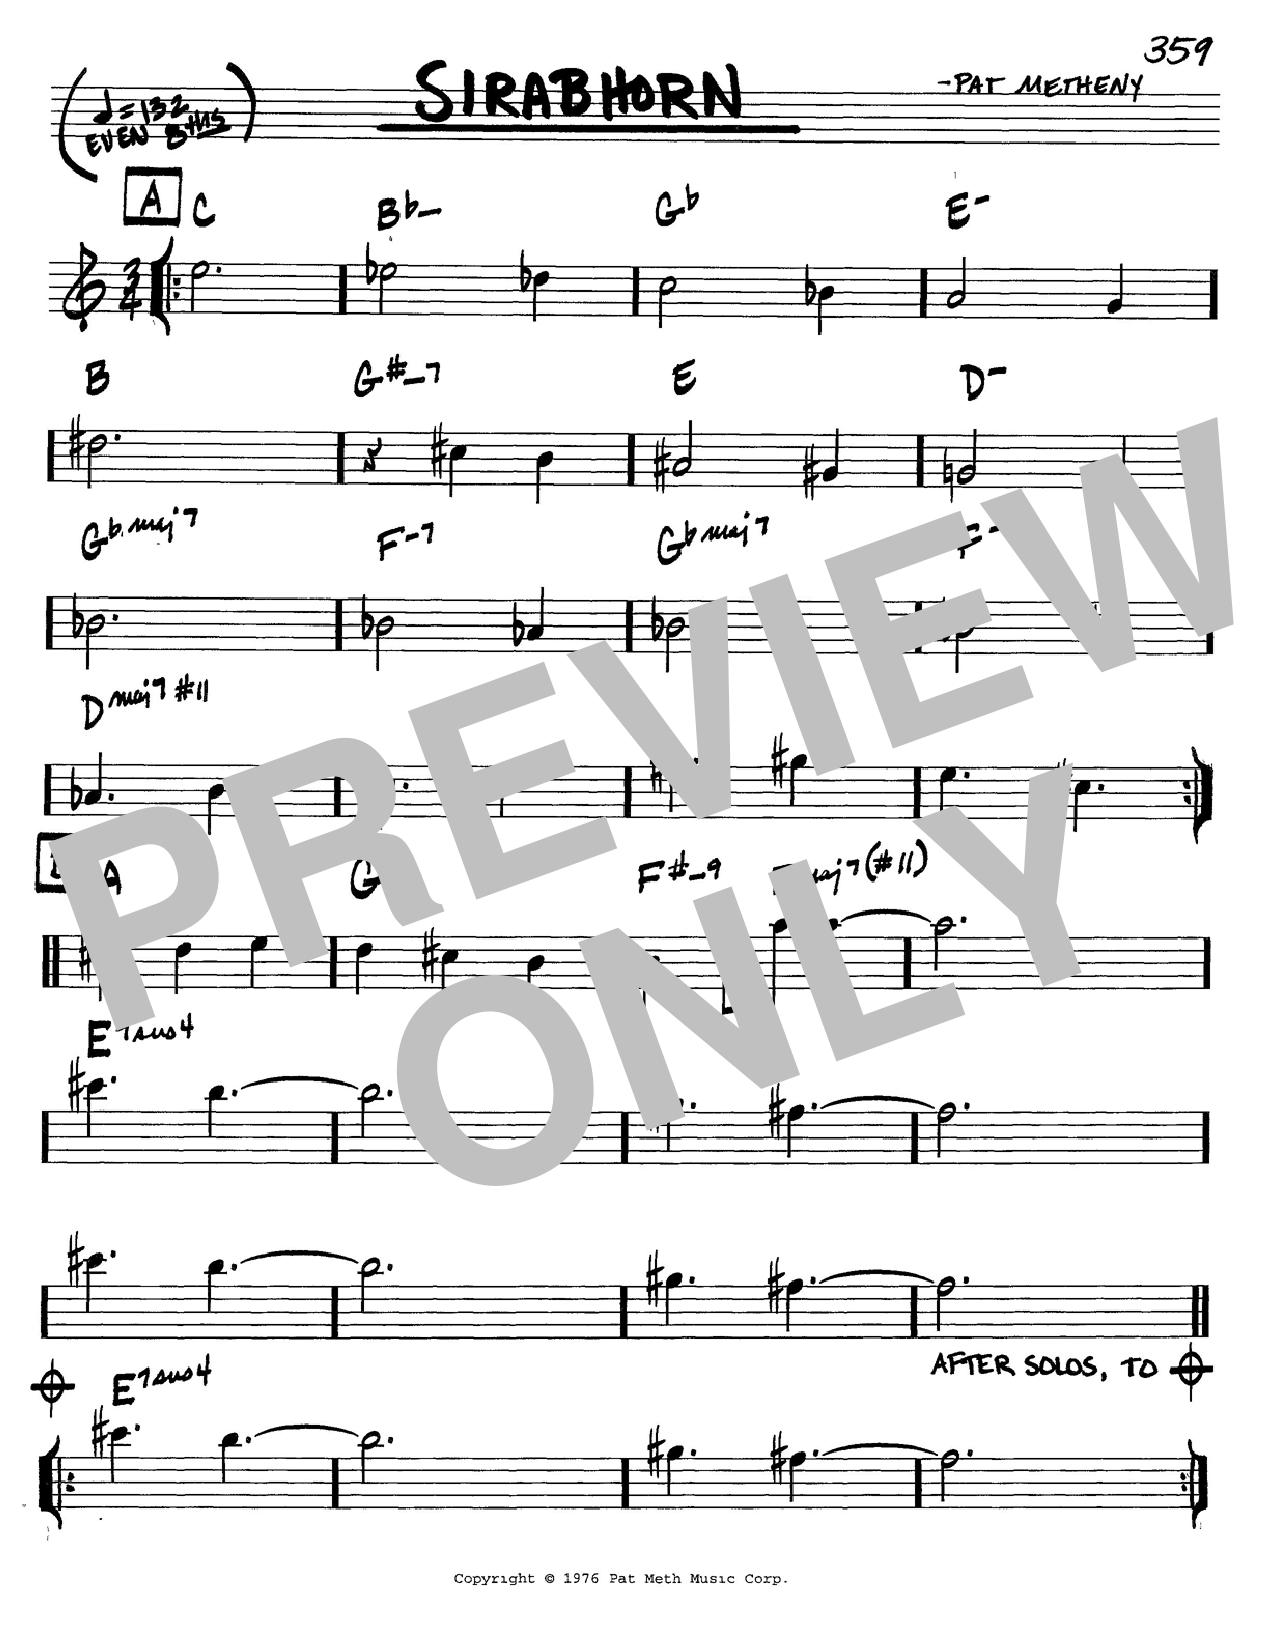 Pat Metheny Sirabhorn sheet music notes and chords. Download Printable PDF.